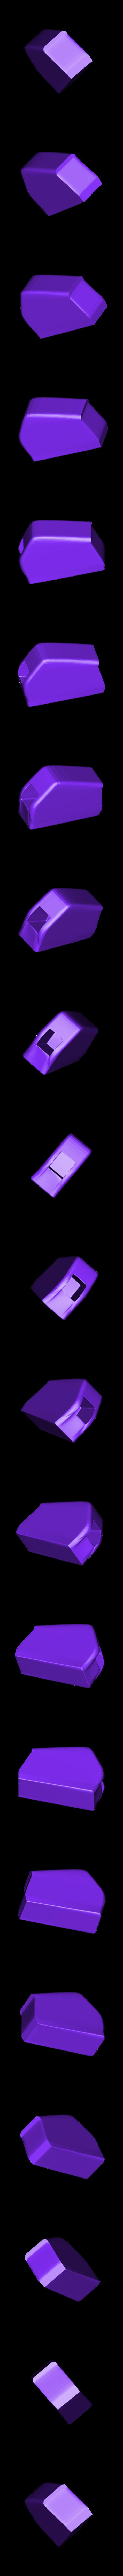 Lucio_slot_rgt.stl Download free STL file Overwatch Lucio Blaster • 3D printer object, Adafruit